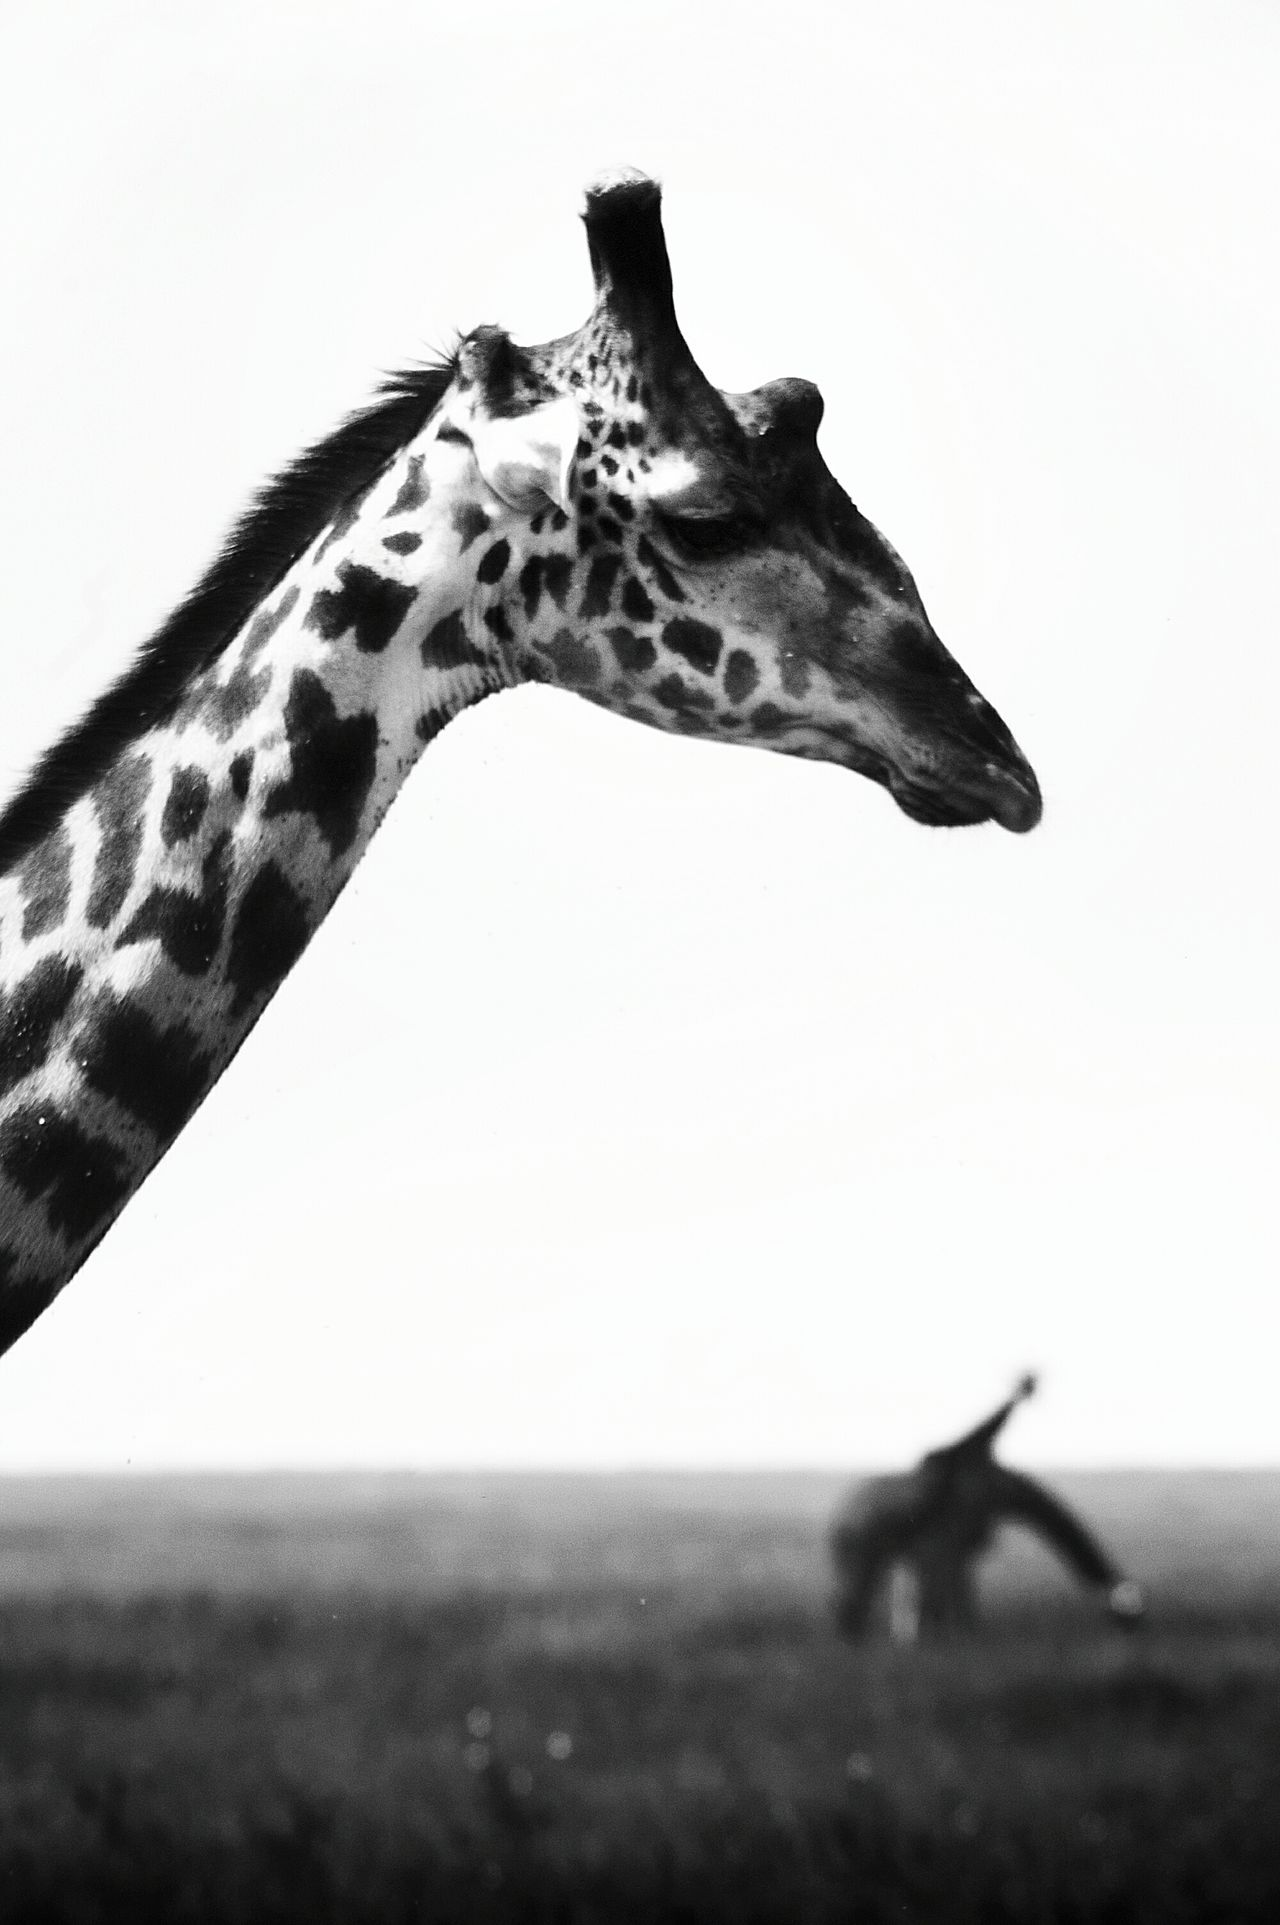 Giraffe Animal One Animal No People Mammal Nature Animal Themes Day Animal Wildlife Animals In The Wild Safari Animals Tanzania Serengeti National Park Nature Beauty In Nature Animal Markings Portrait Portrait Photography